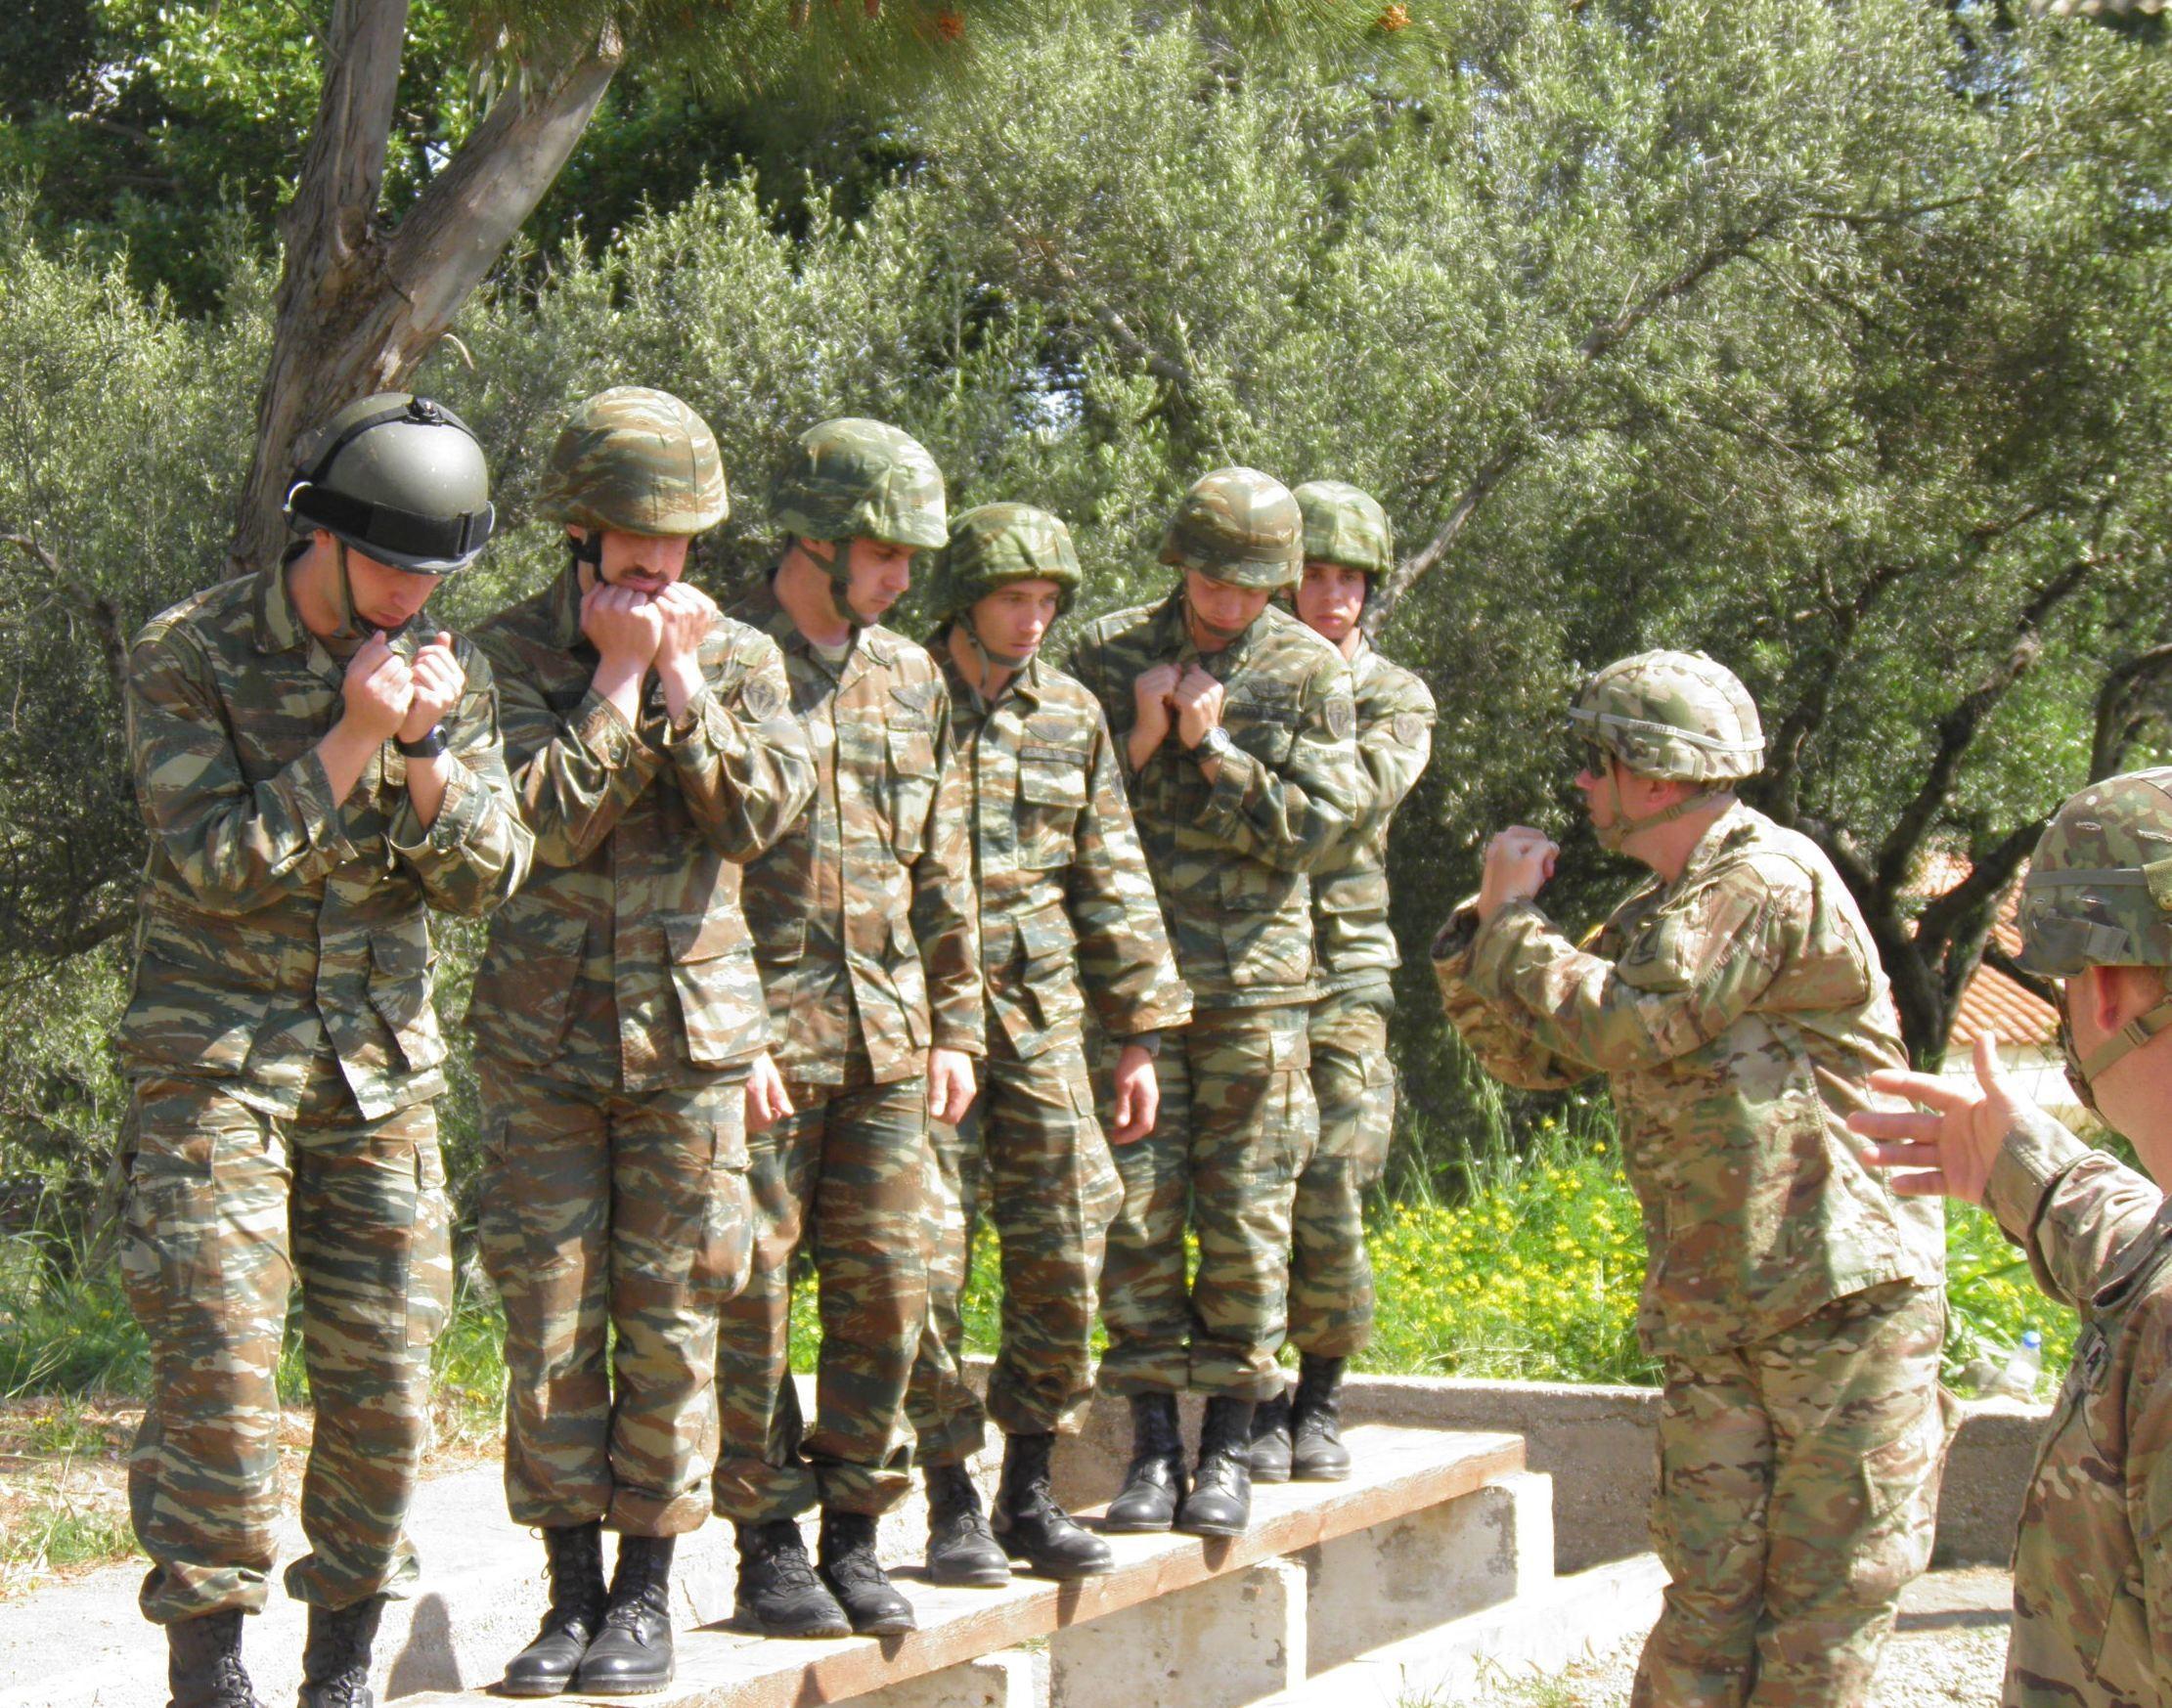 Army Running Cadences – Top 5 – Military Cadence